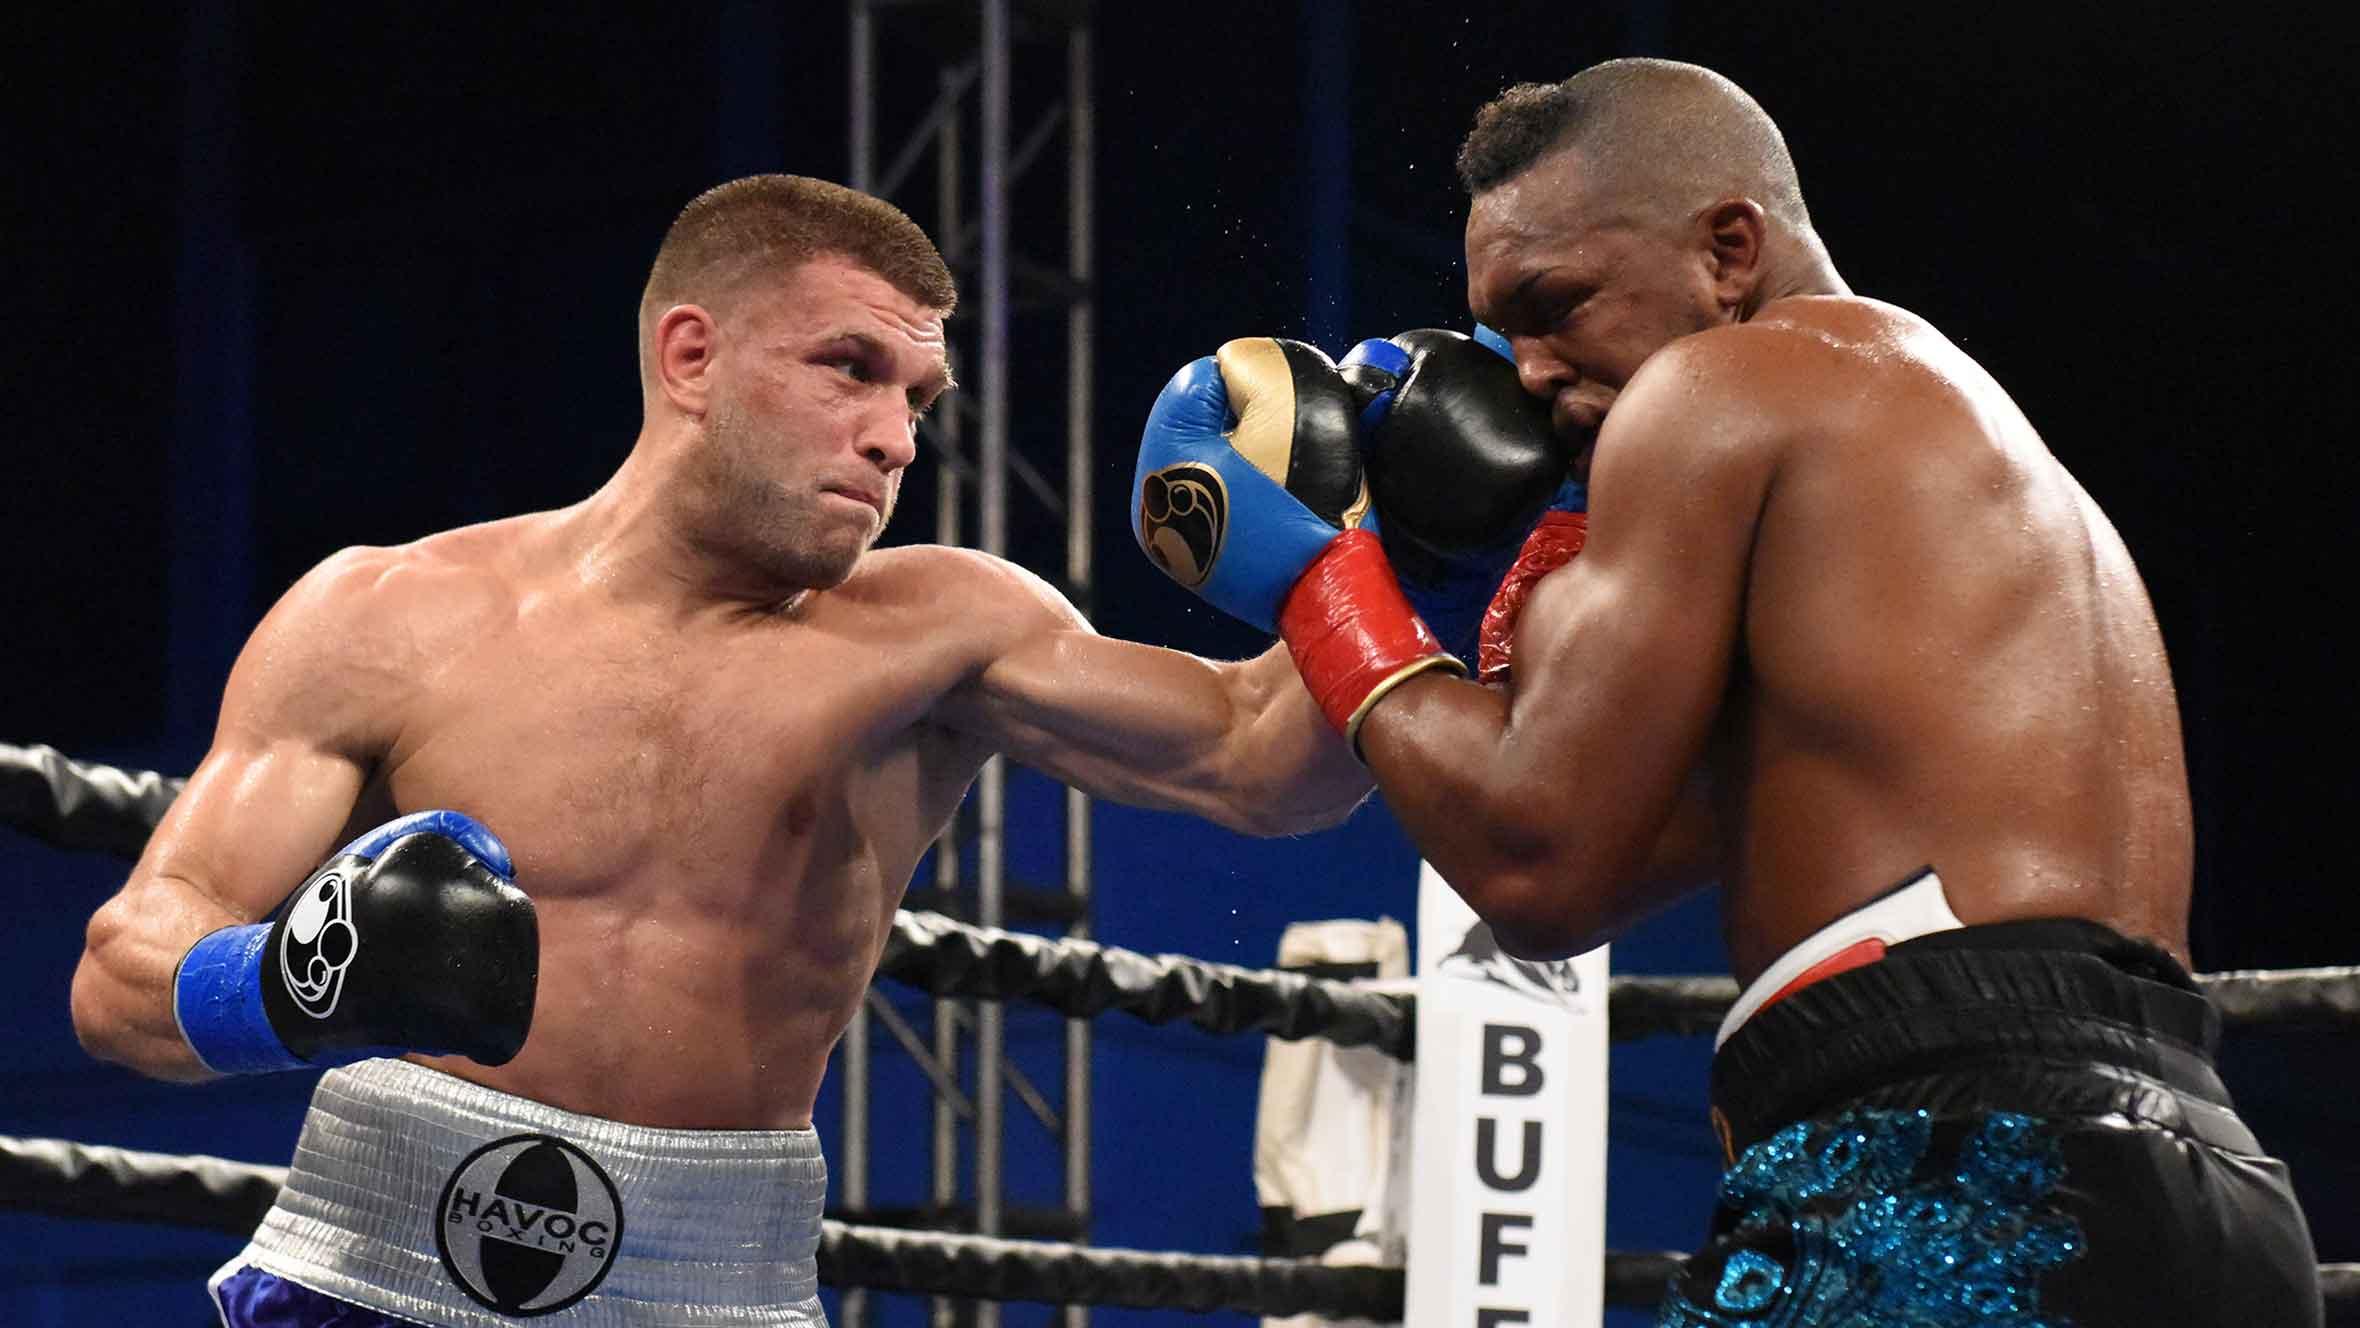 Sergiy Derevyanchenko (left) vs. Tureano Johnson. Photo courtesy of Premier Boxing Champions